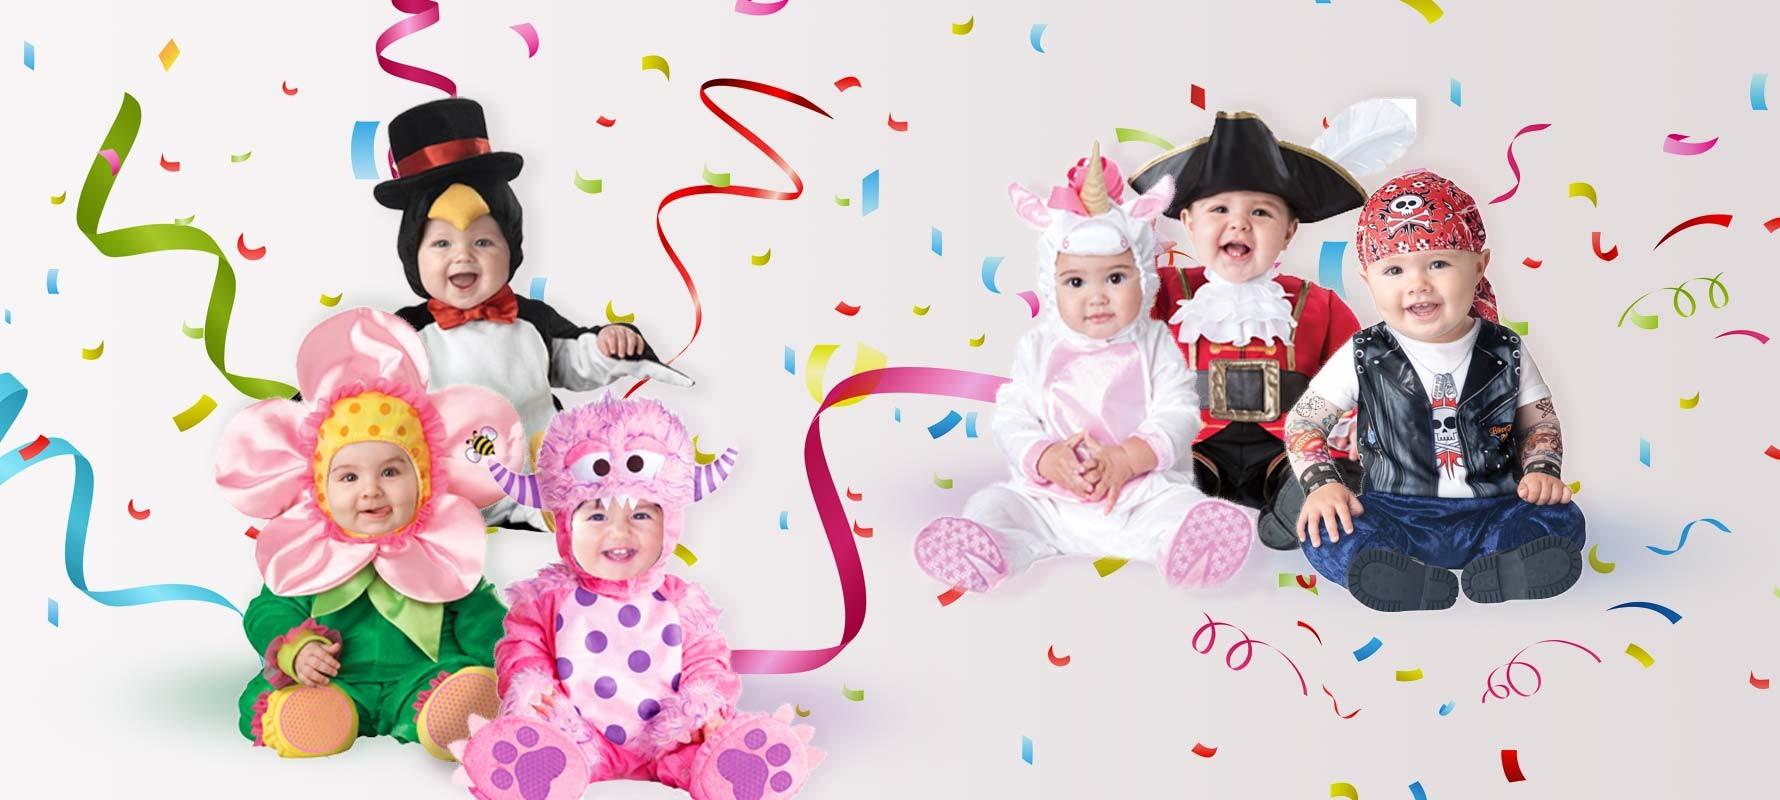 Newborn costumes